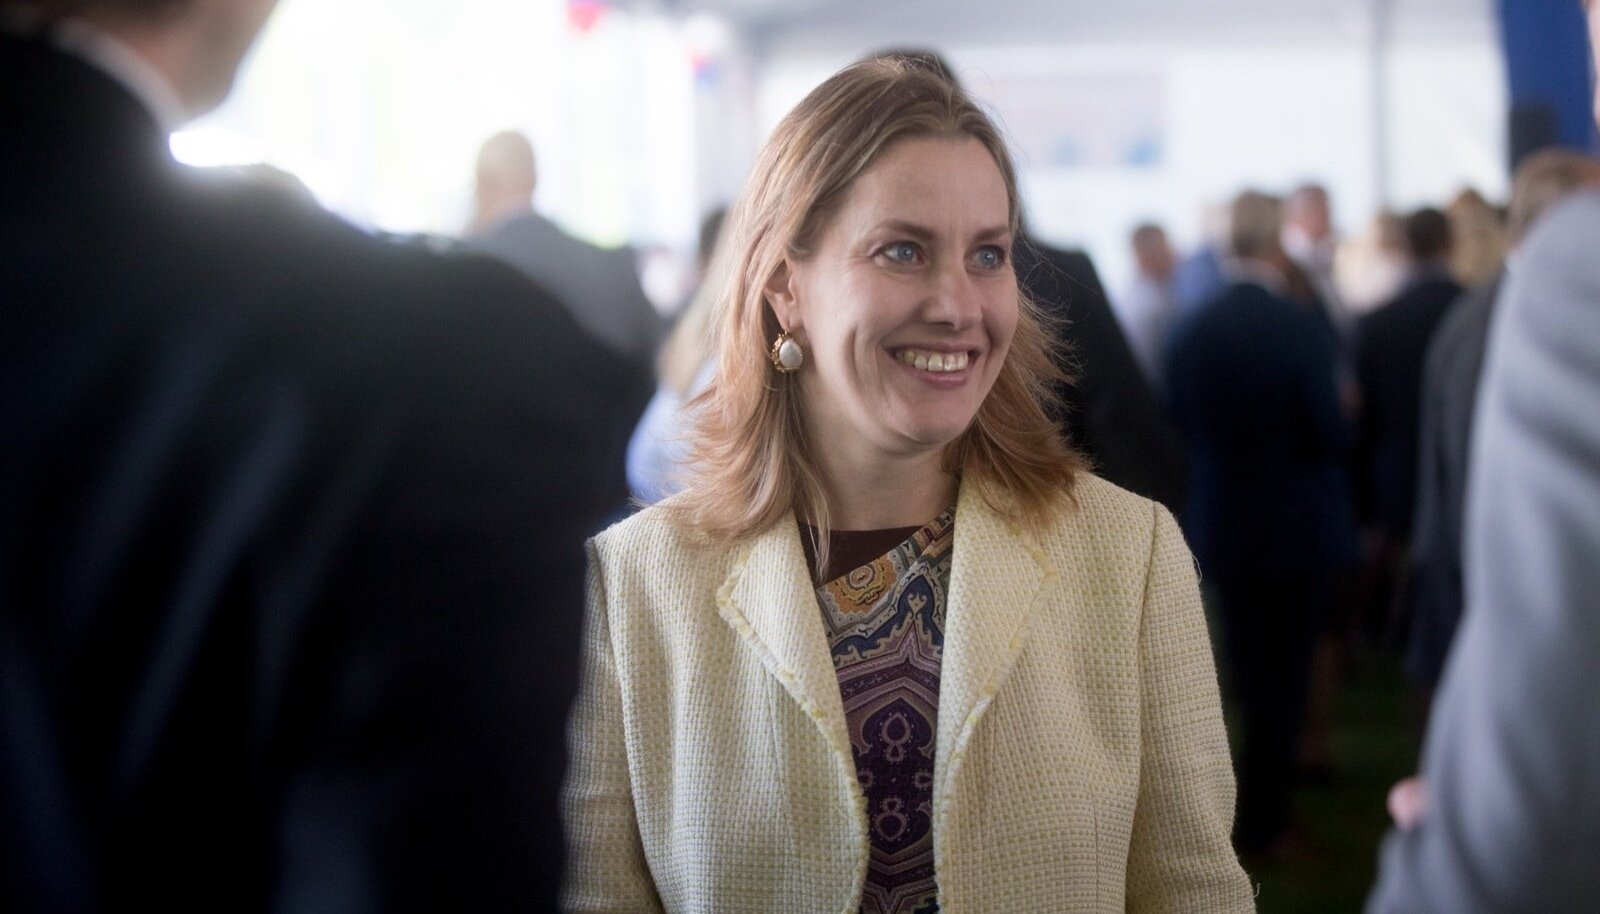 Eesti-Egiptuse parlamendirühma esimees Oudekki Loone